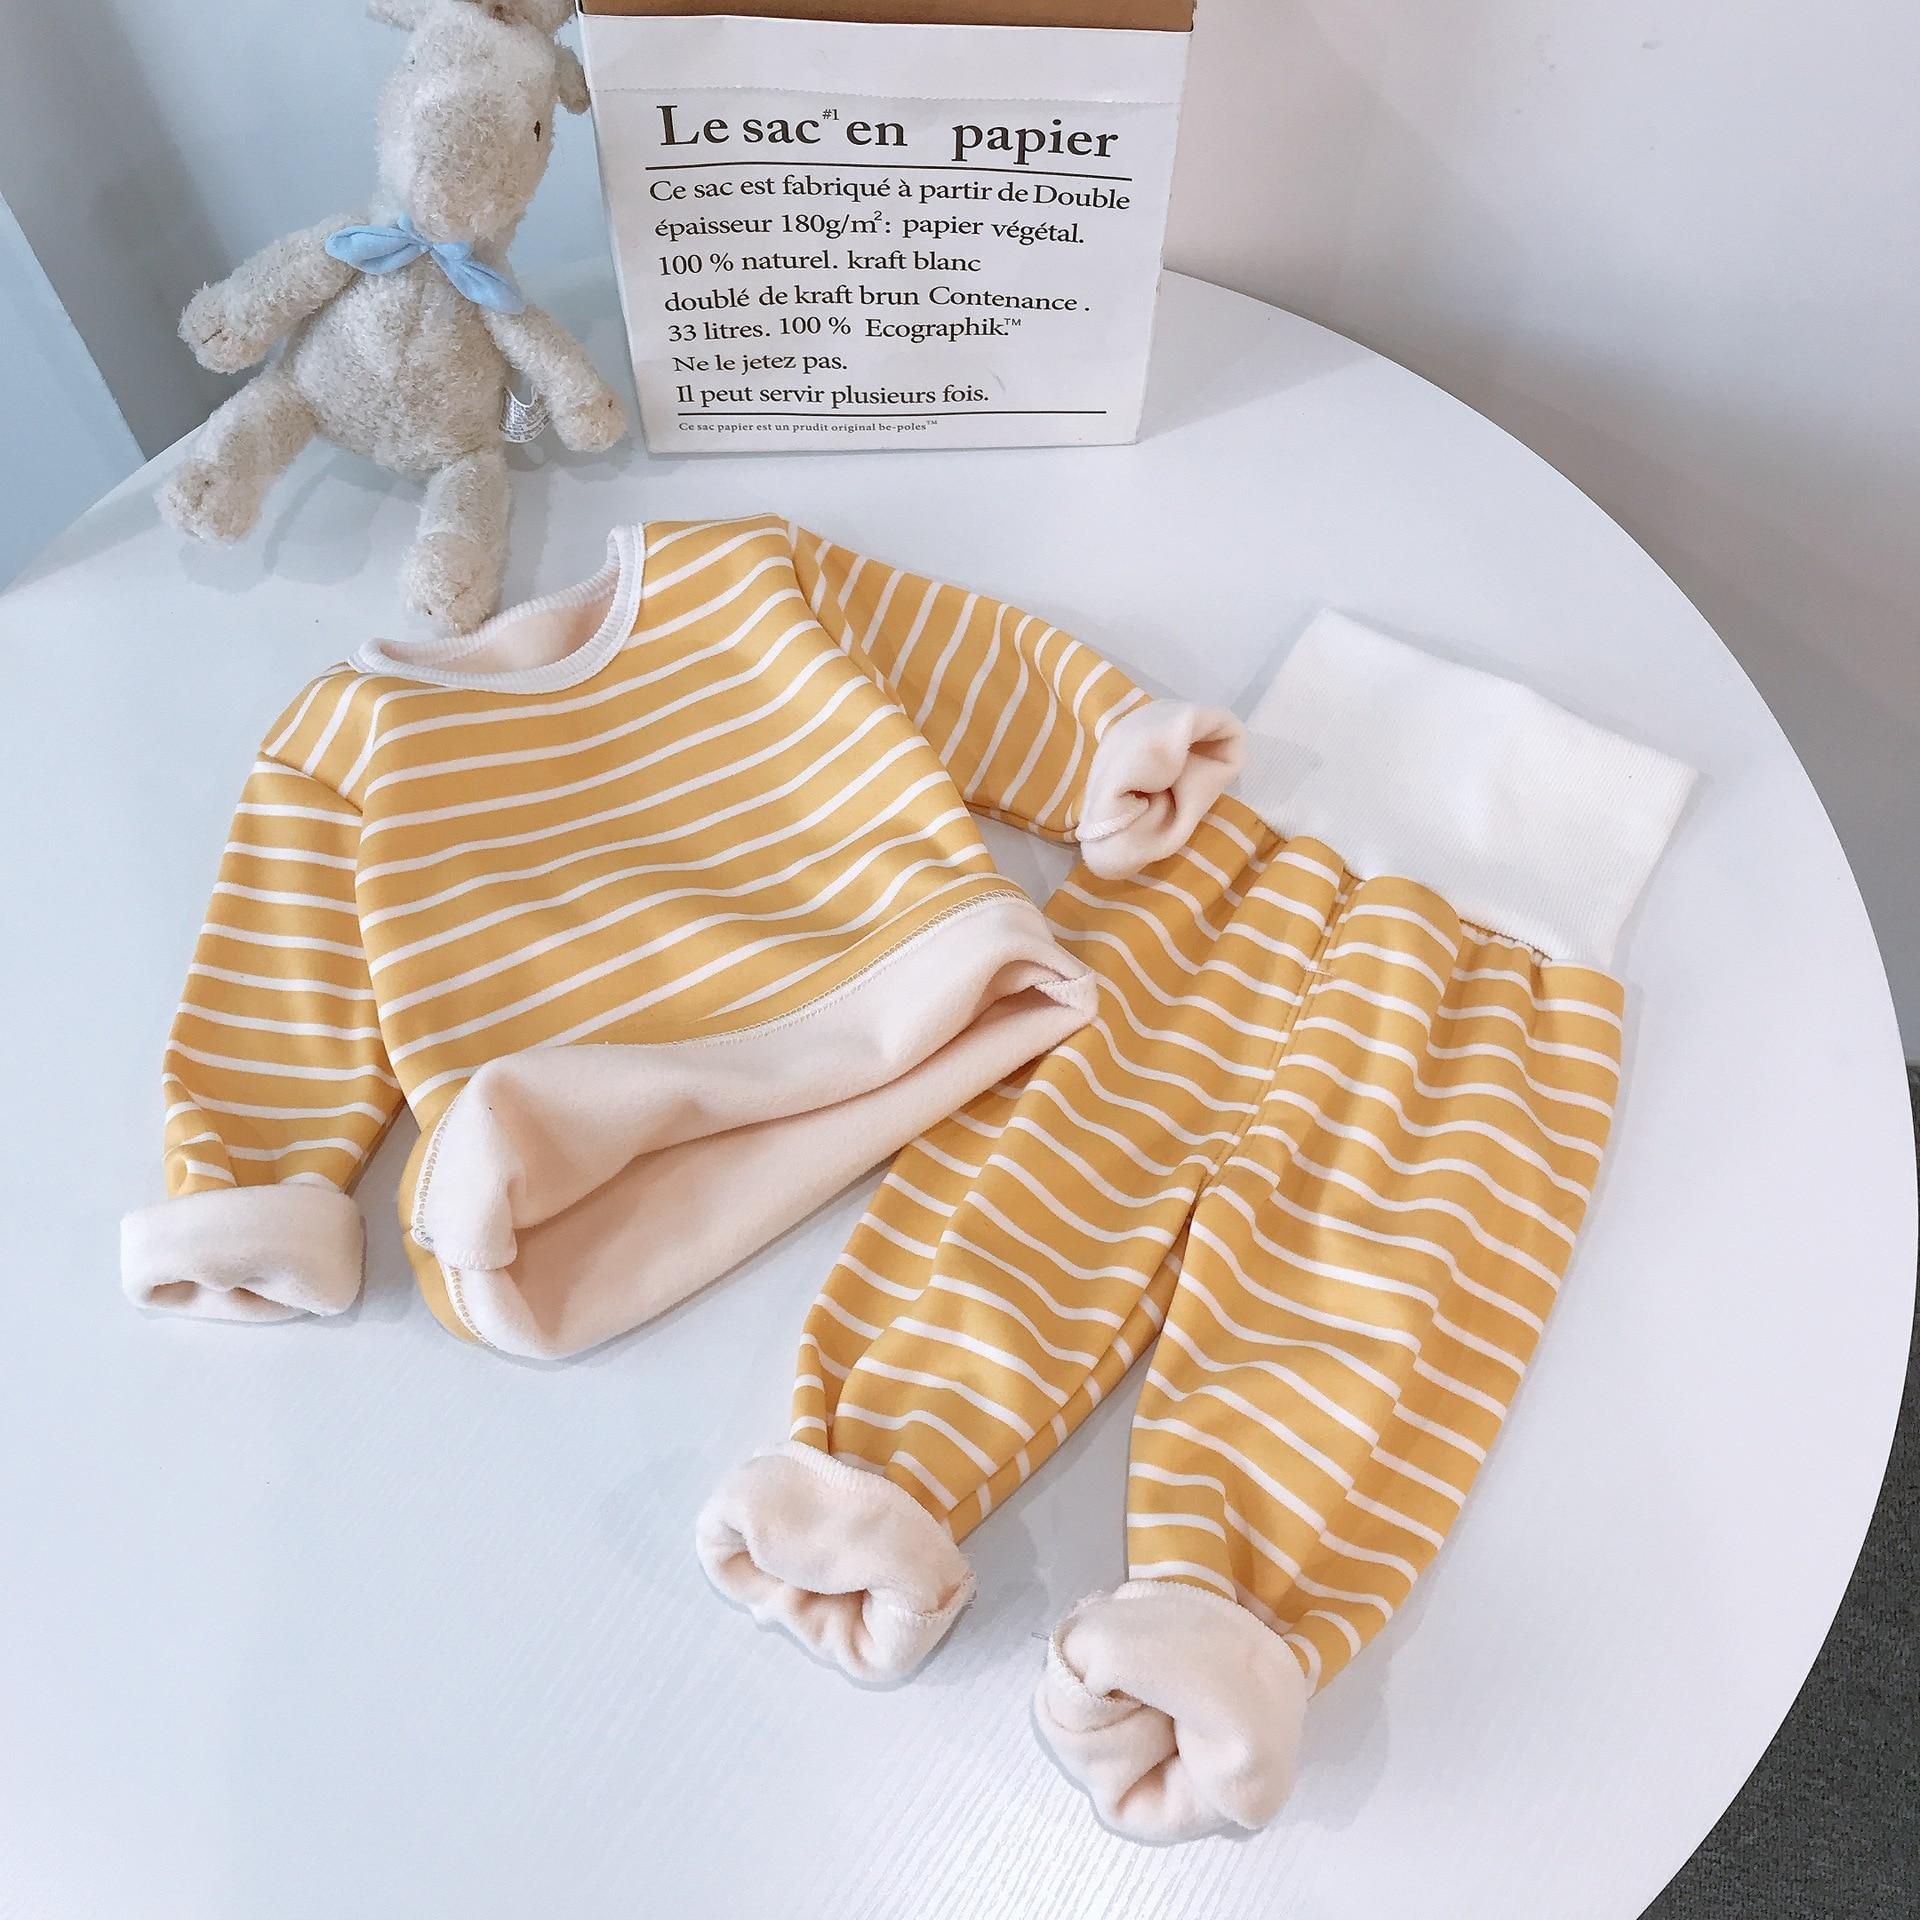 Children Pajamas Sets Baby Boys Girls Clothing Sweatshirt Waist Pants Set Toddler Warm Autumn Winter Outfits Kids Suit Clothes 5